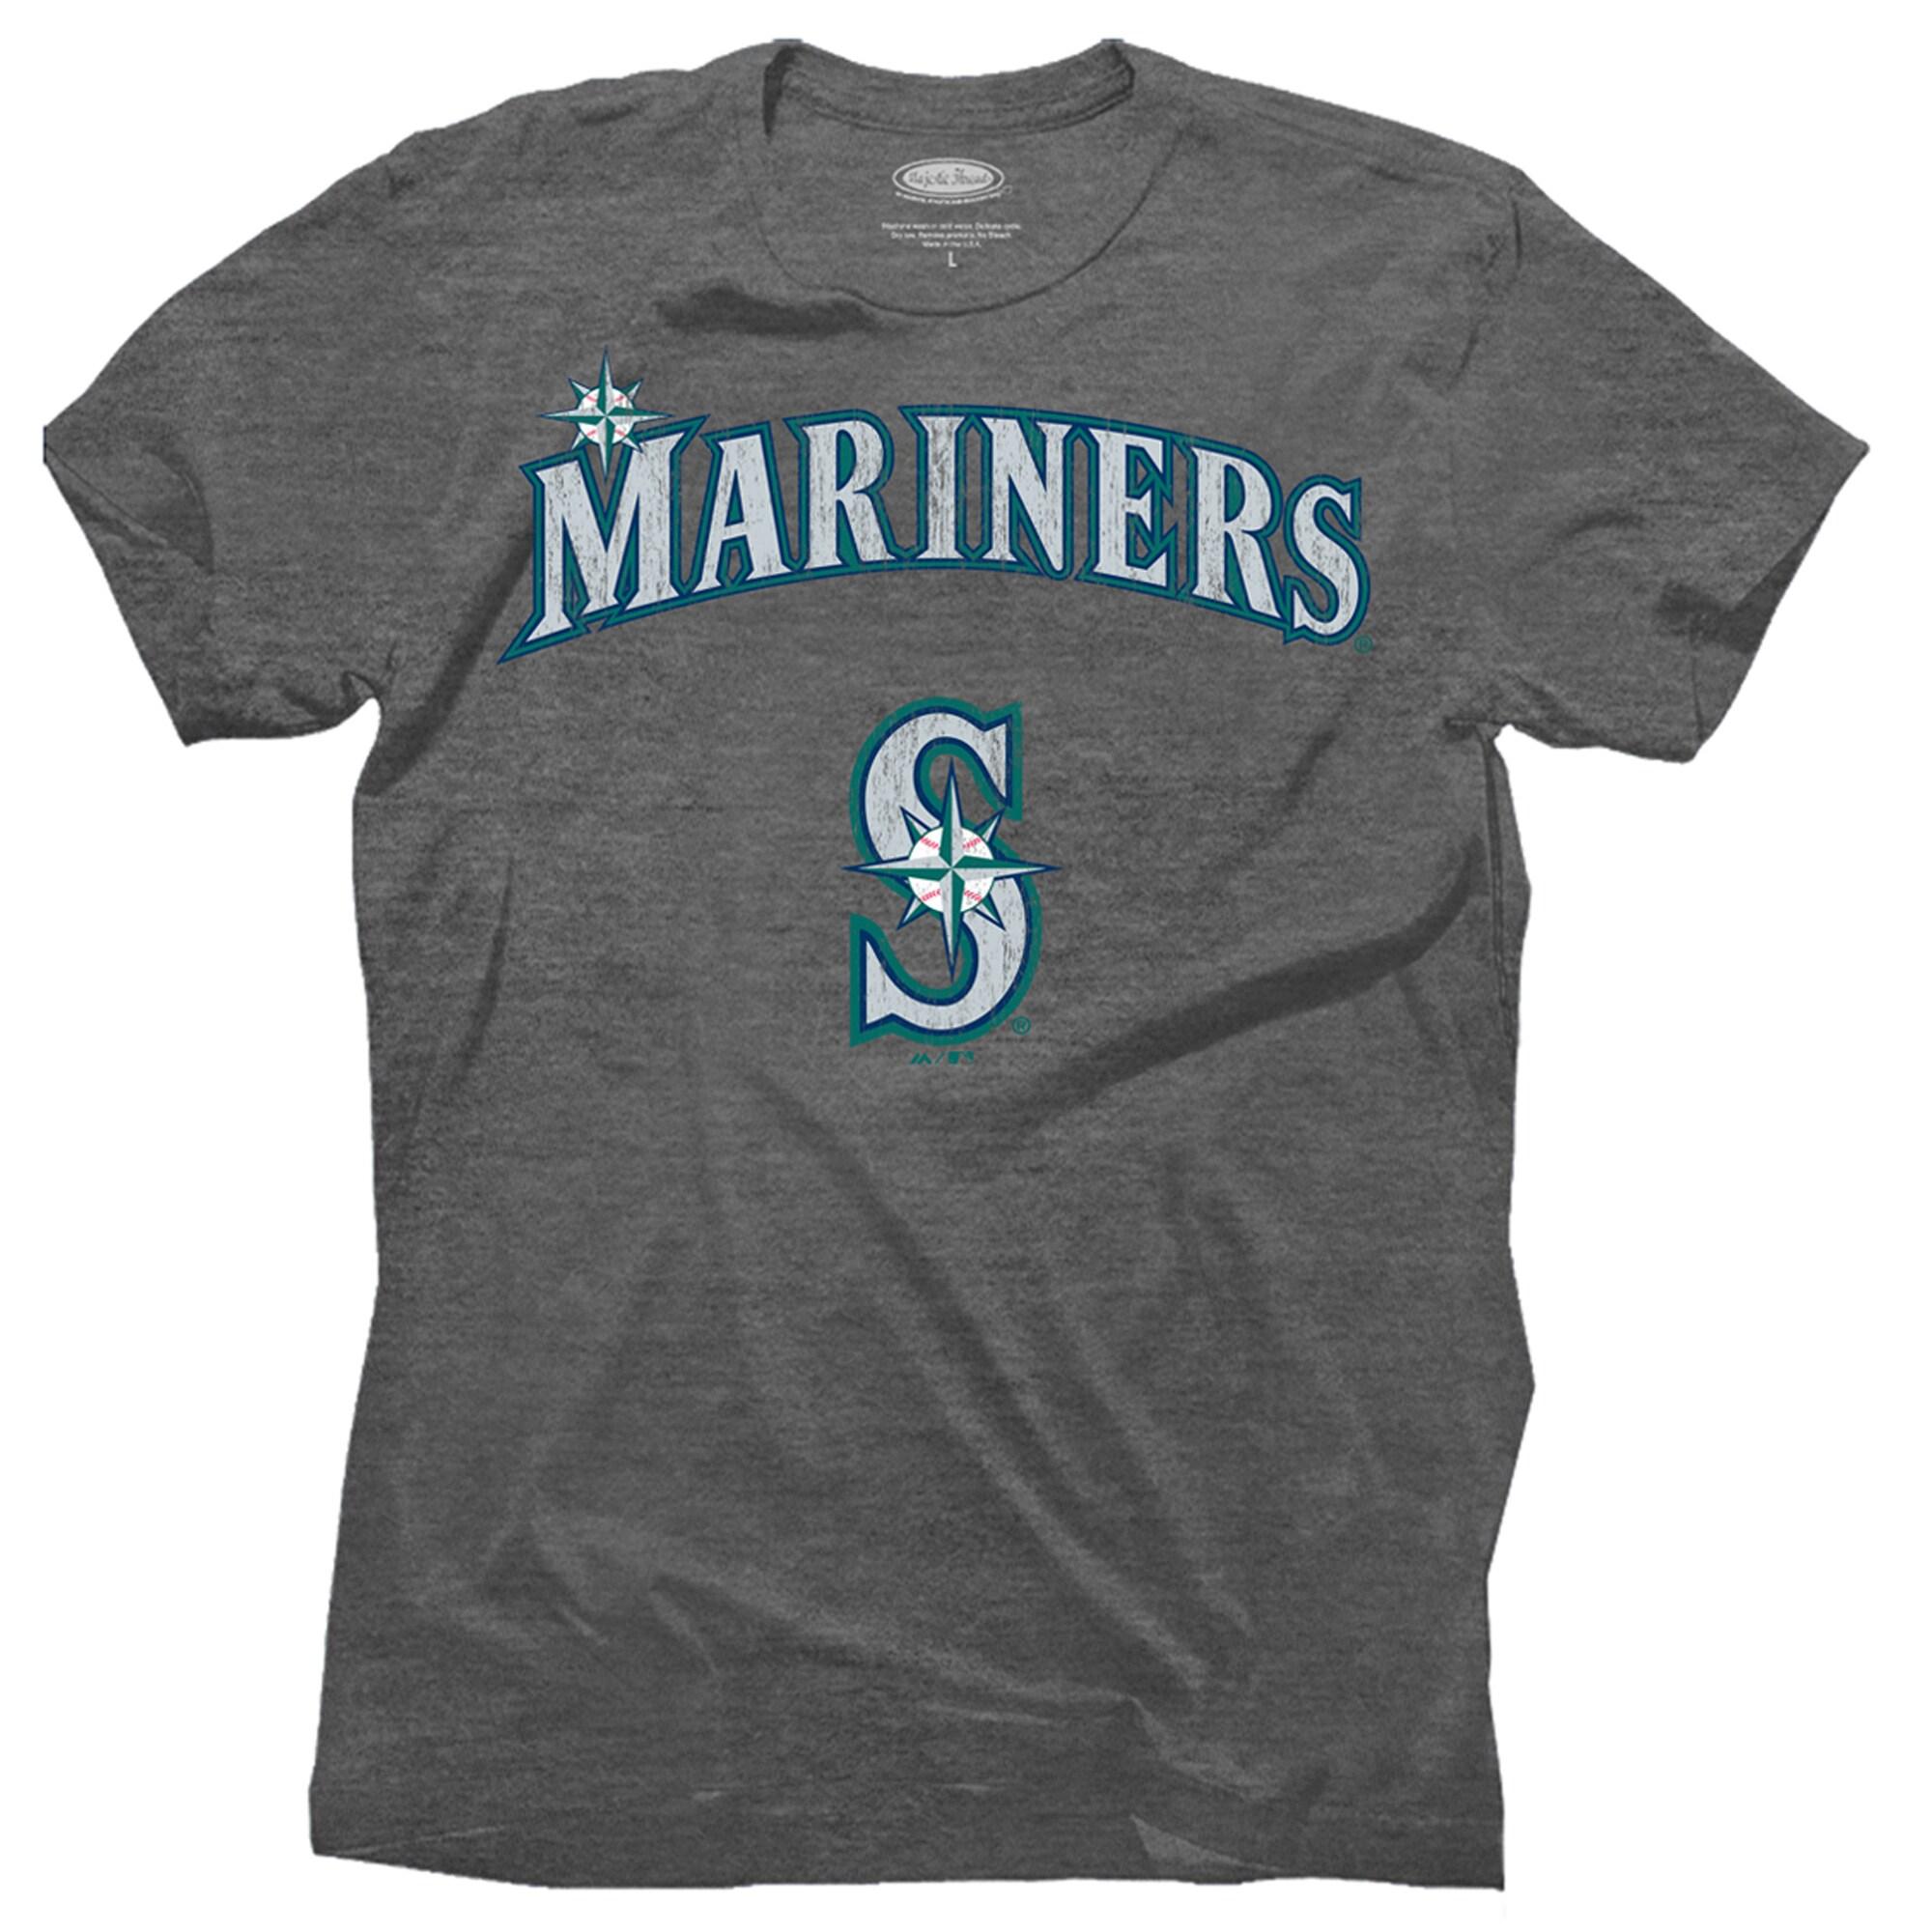 Seattle Mariners Majestic Threads Premium Granite Tri-Blend T-Shirt - Charcoal